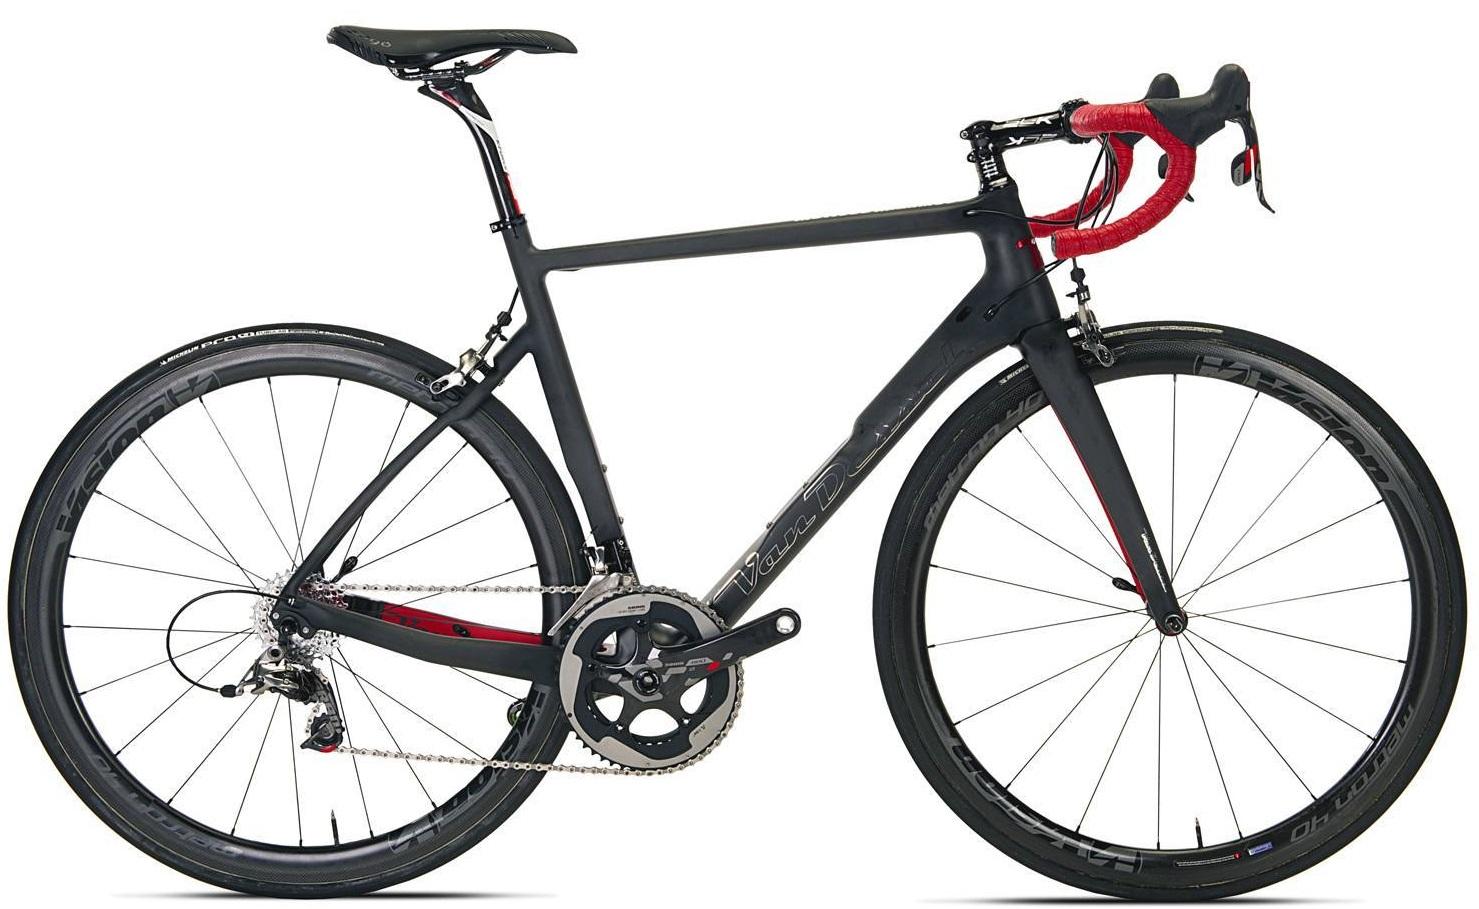 MOTIVUS-MAXIMUS-Van dessel 2015 sram redneuroticarnutzfelt_bicycles_ar_frd 2015 black red dura